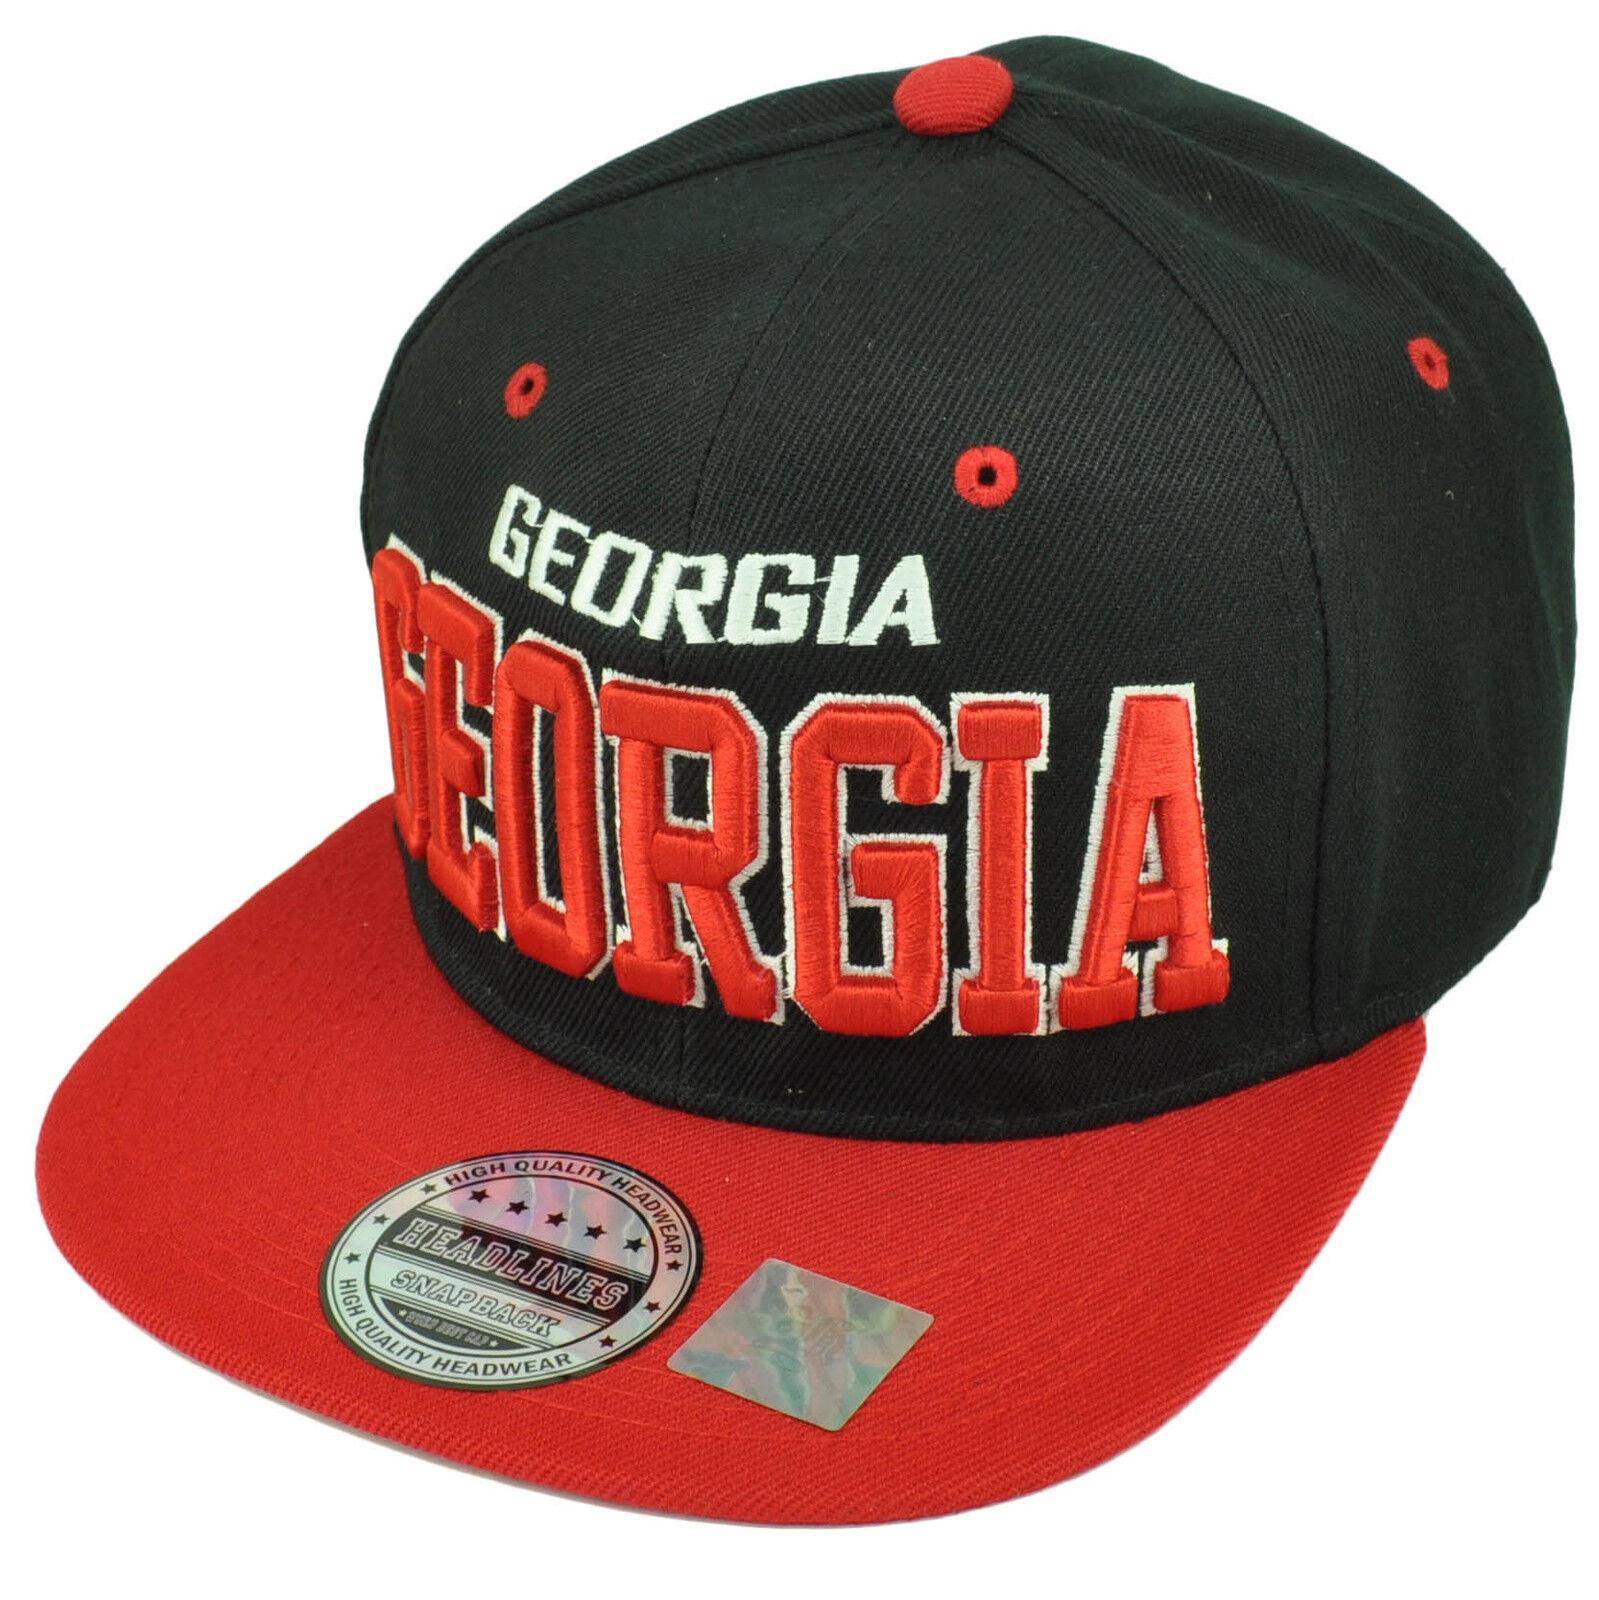 Georgia Empire State South USA Black Hat Red Snapback Flat Bill Hat Black Cap Adjustable 35f403